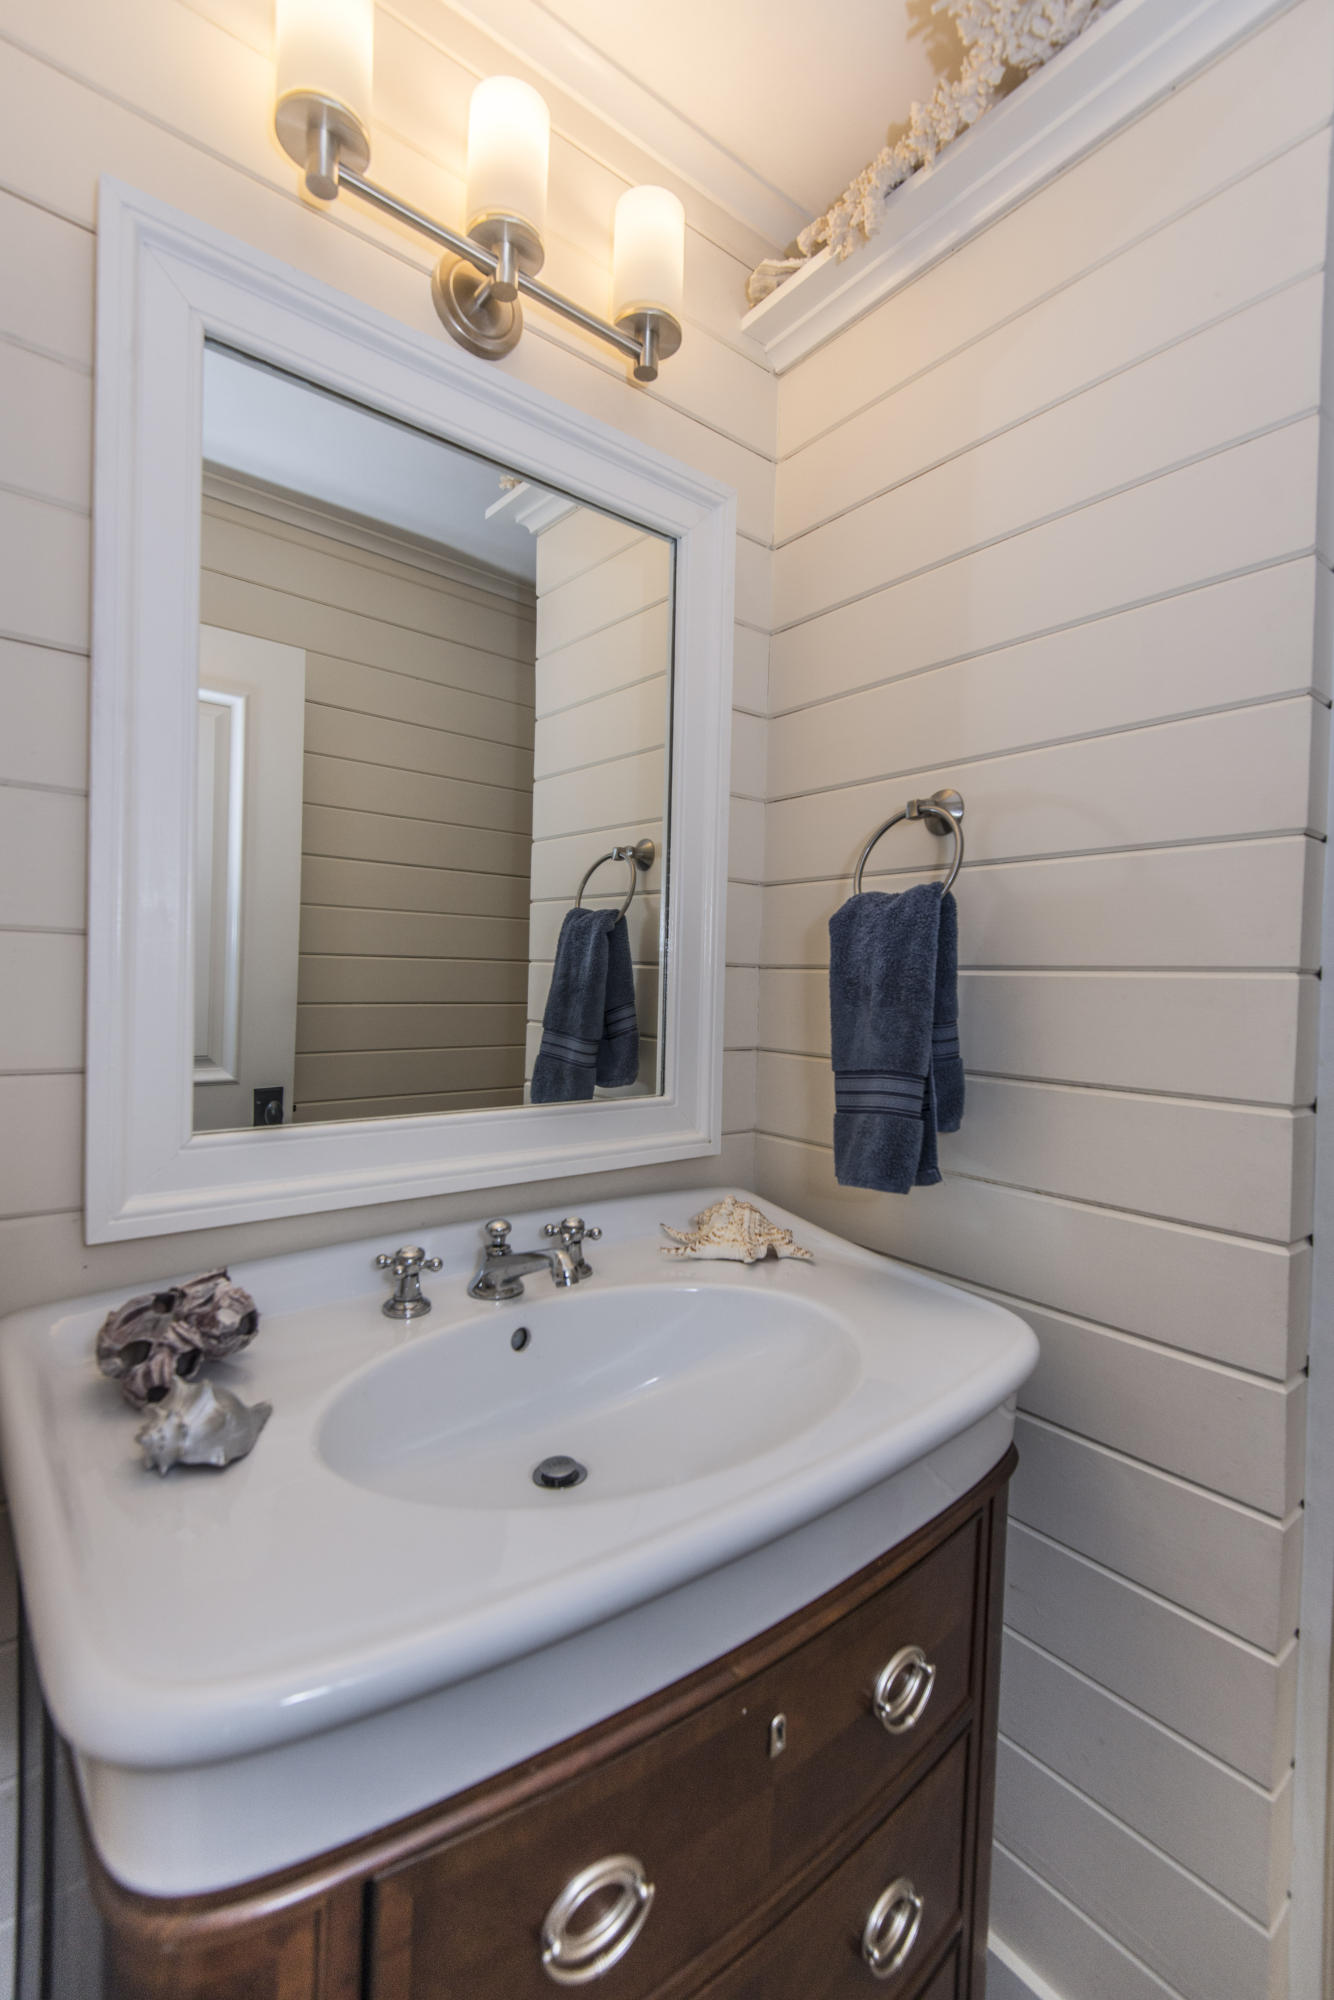 Wappoo Creek Place Homes For Sale - 43 Wappoo Creek, Charleston, SC - 15